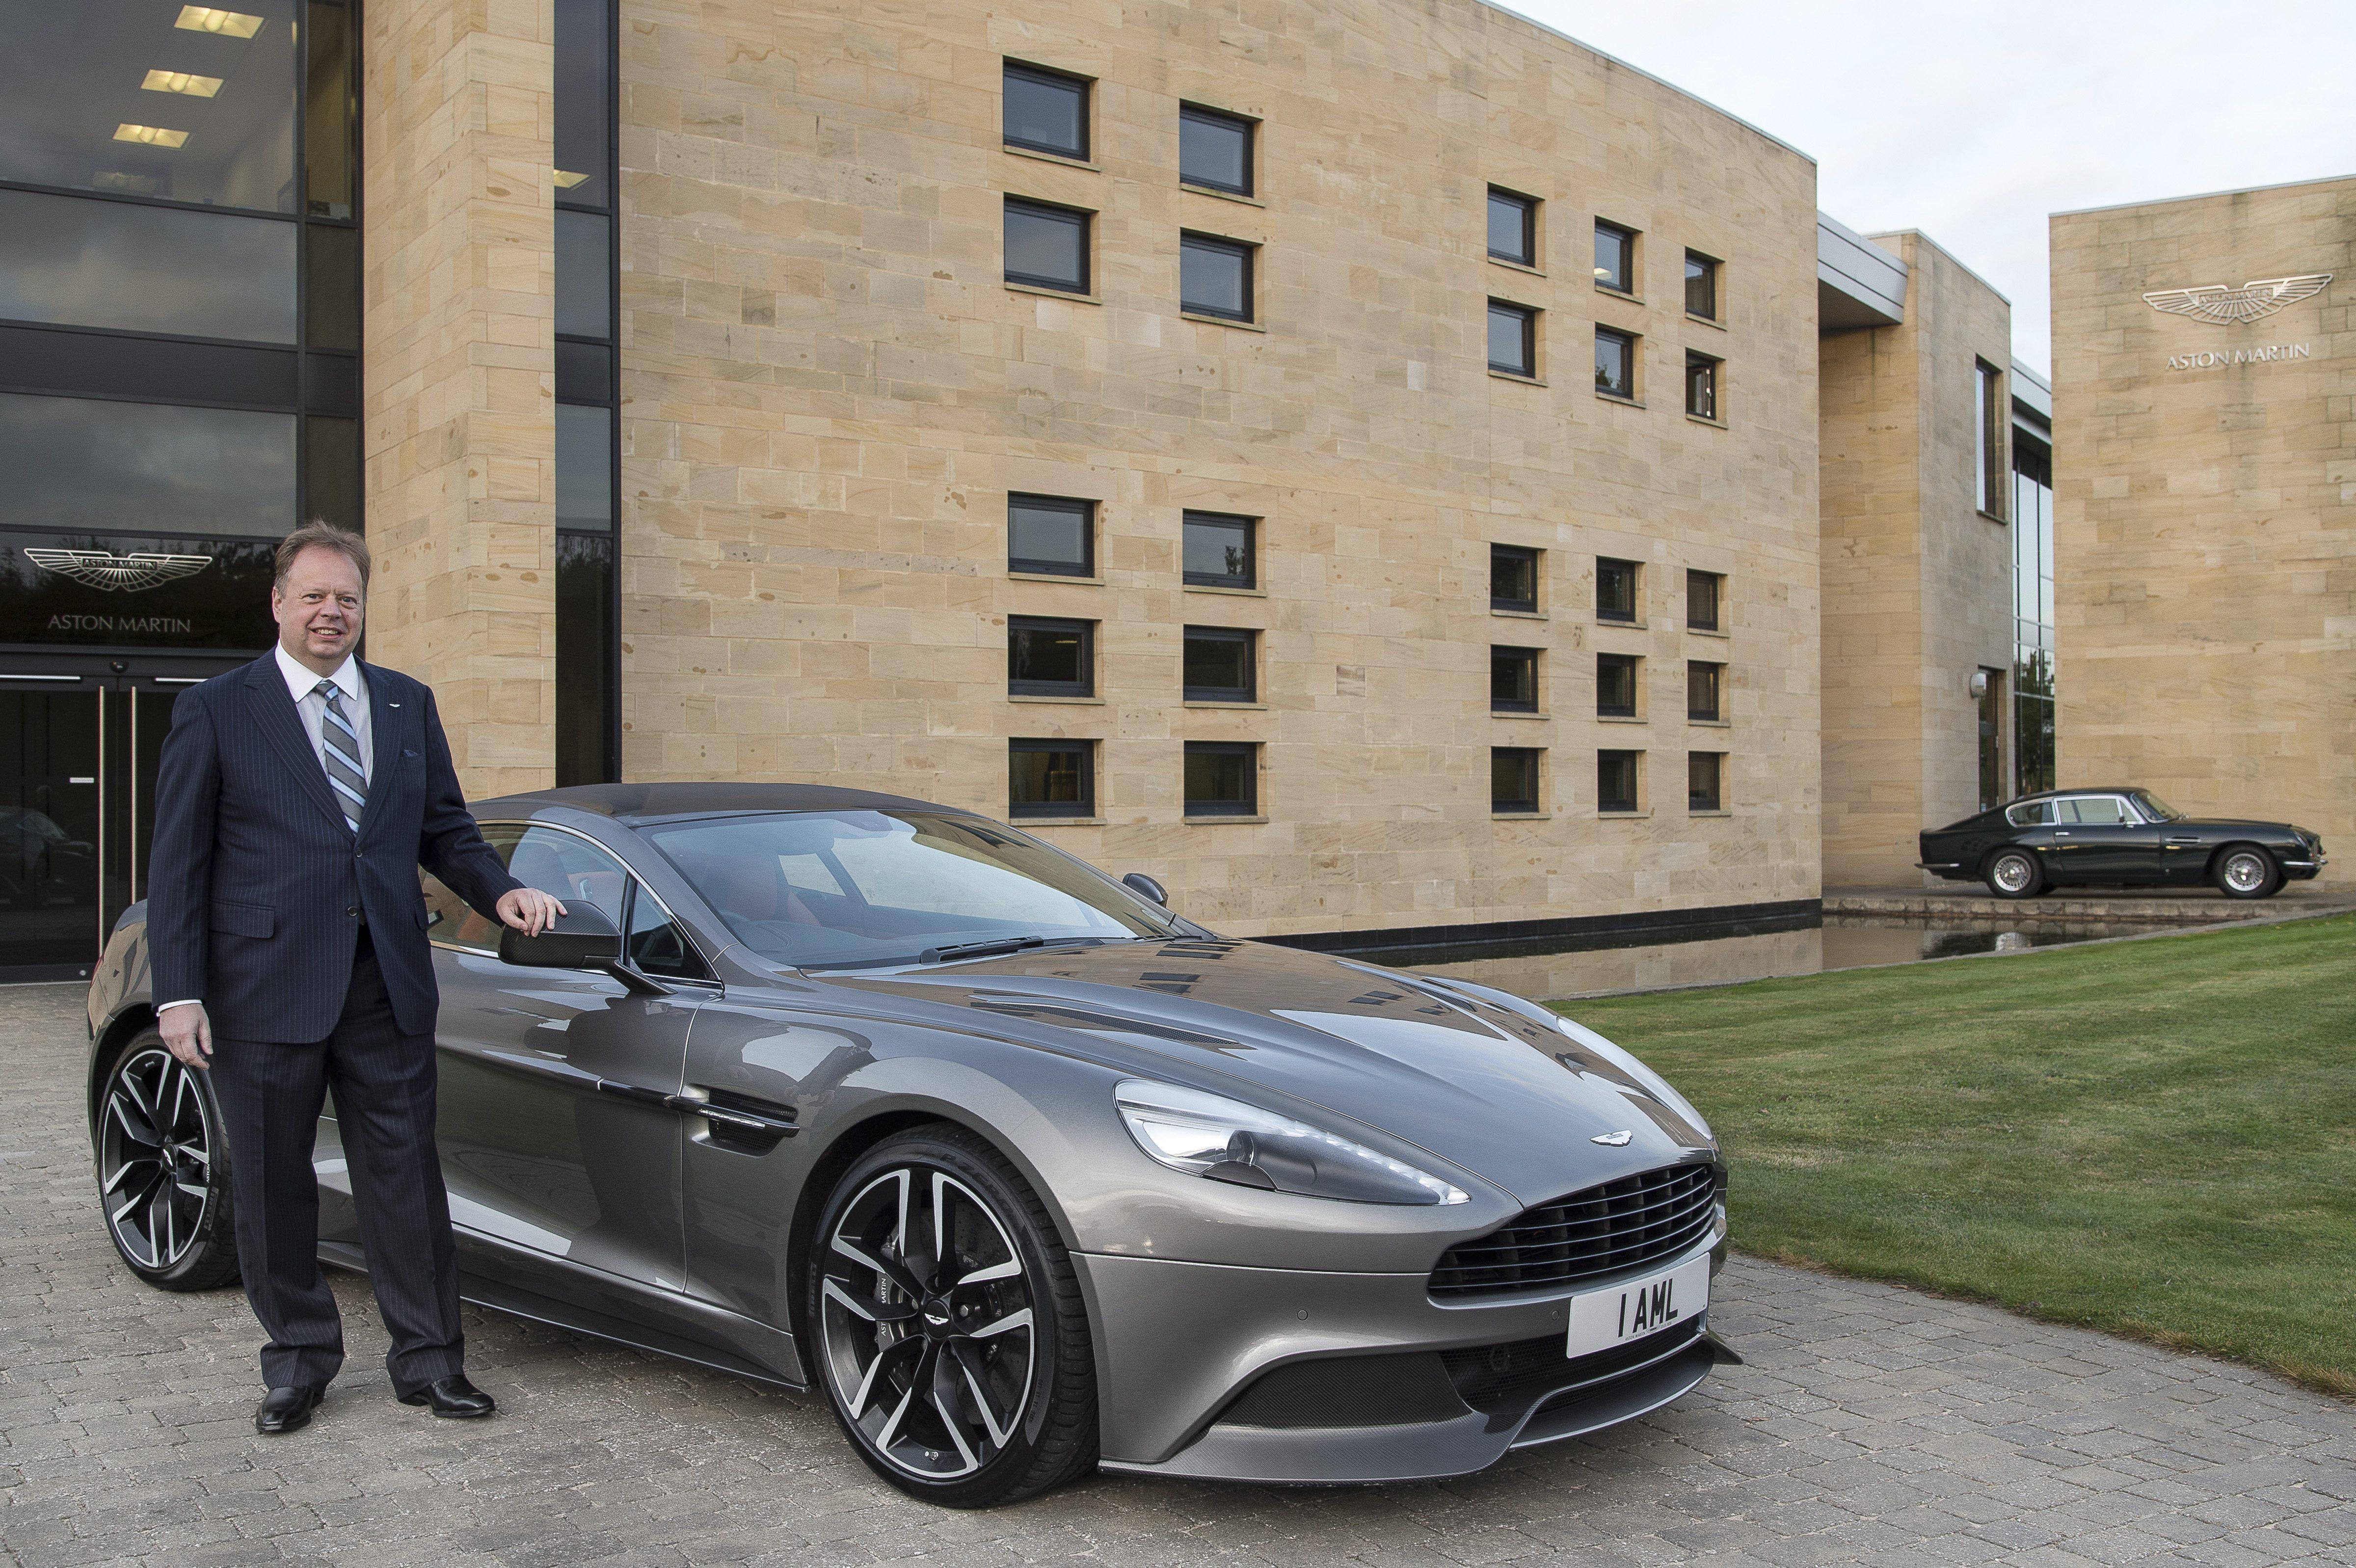 Aston Martin Reveals New Ceo Andy Palmer Littlegate